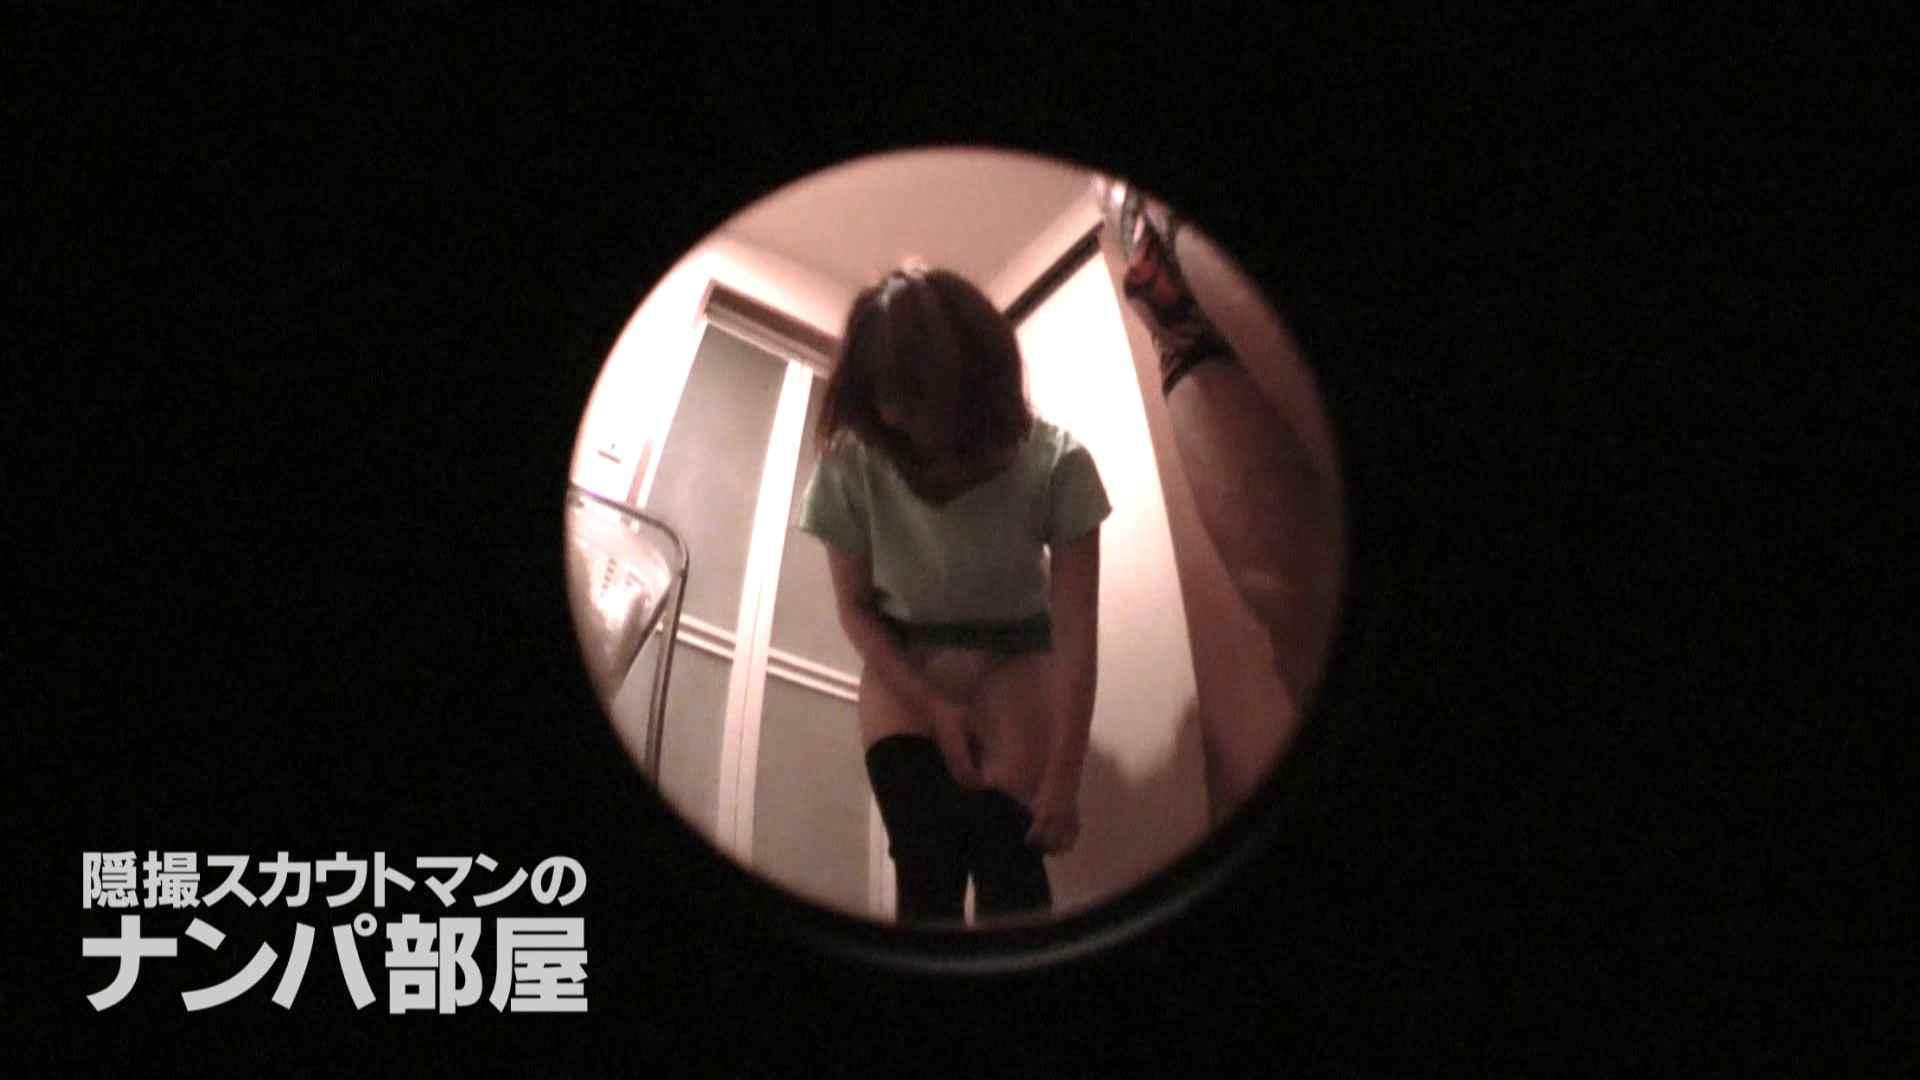 sii ナンパ セックス無修正動画無料 49画像 23